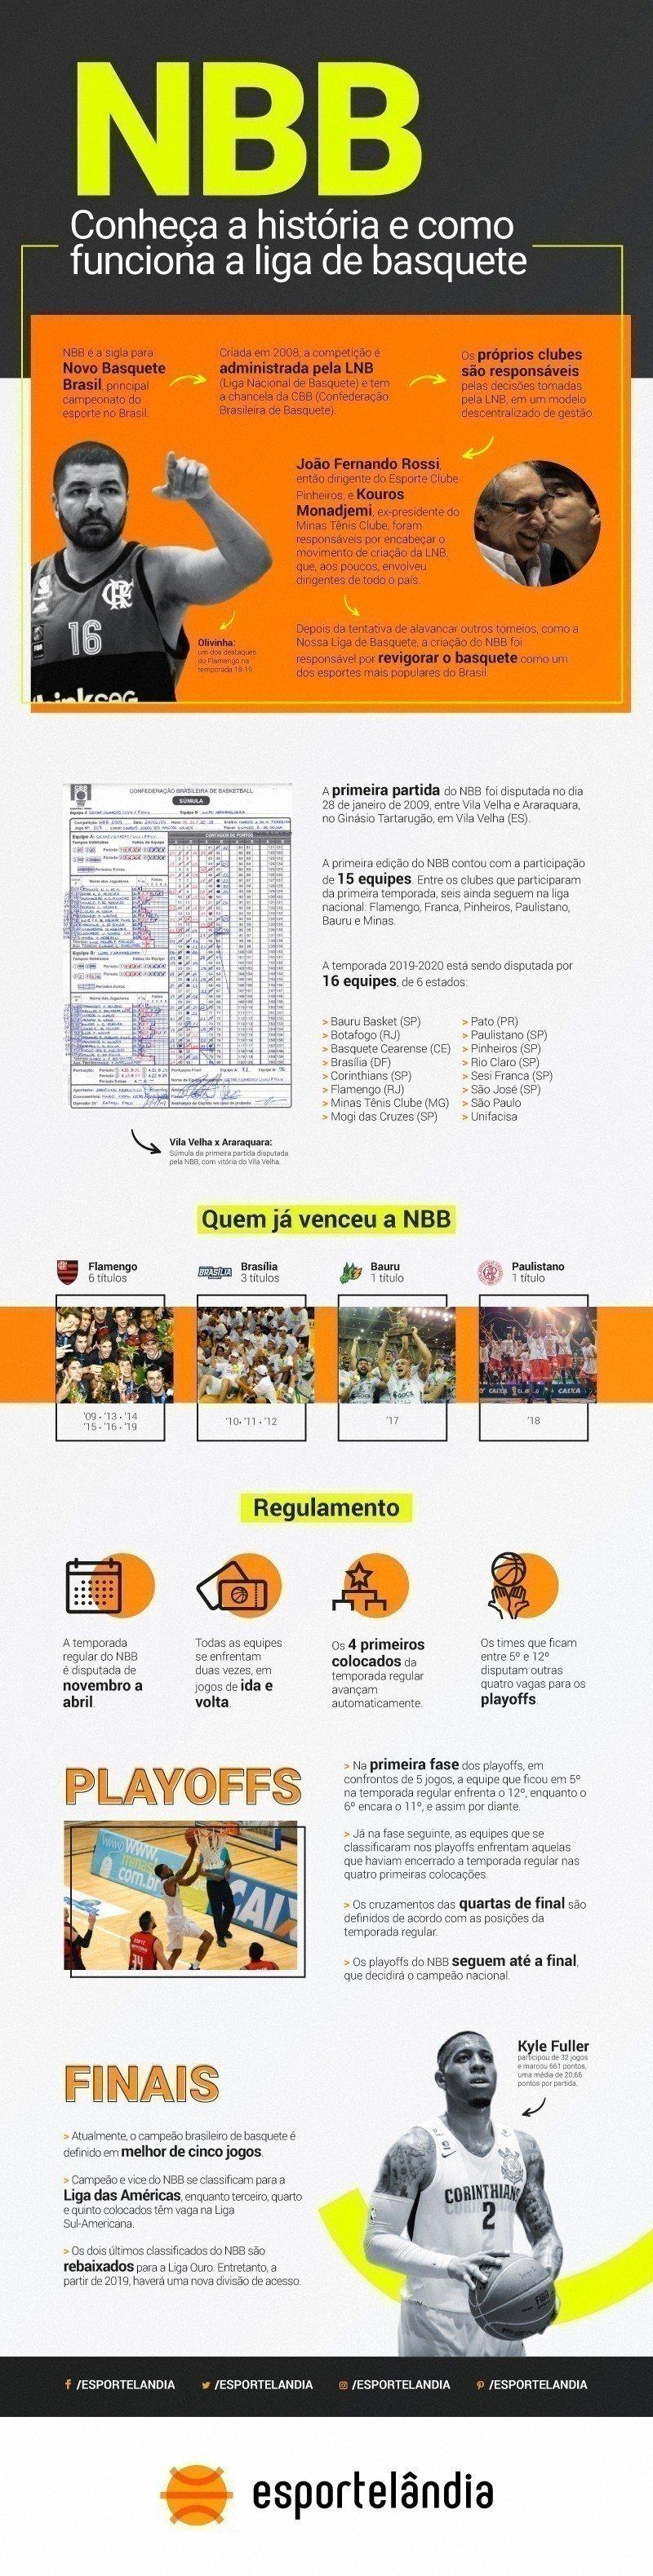 NBB 2019-2020